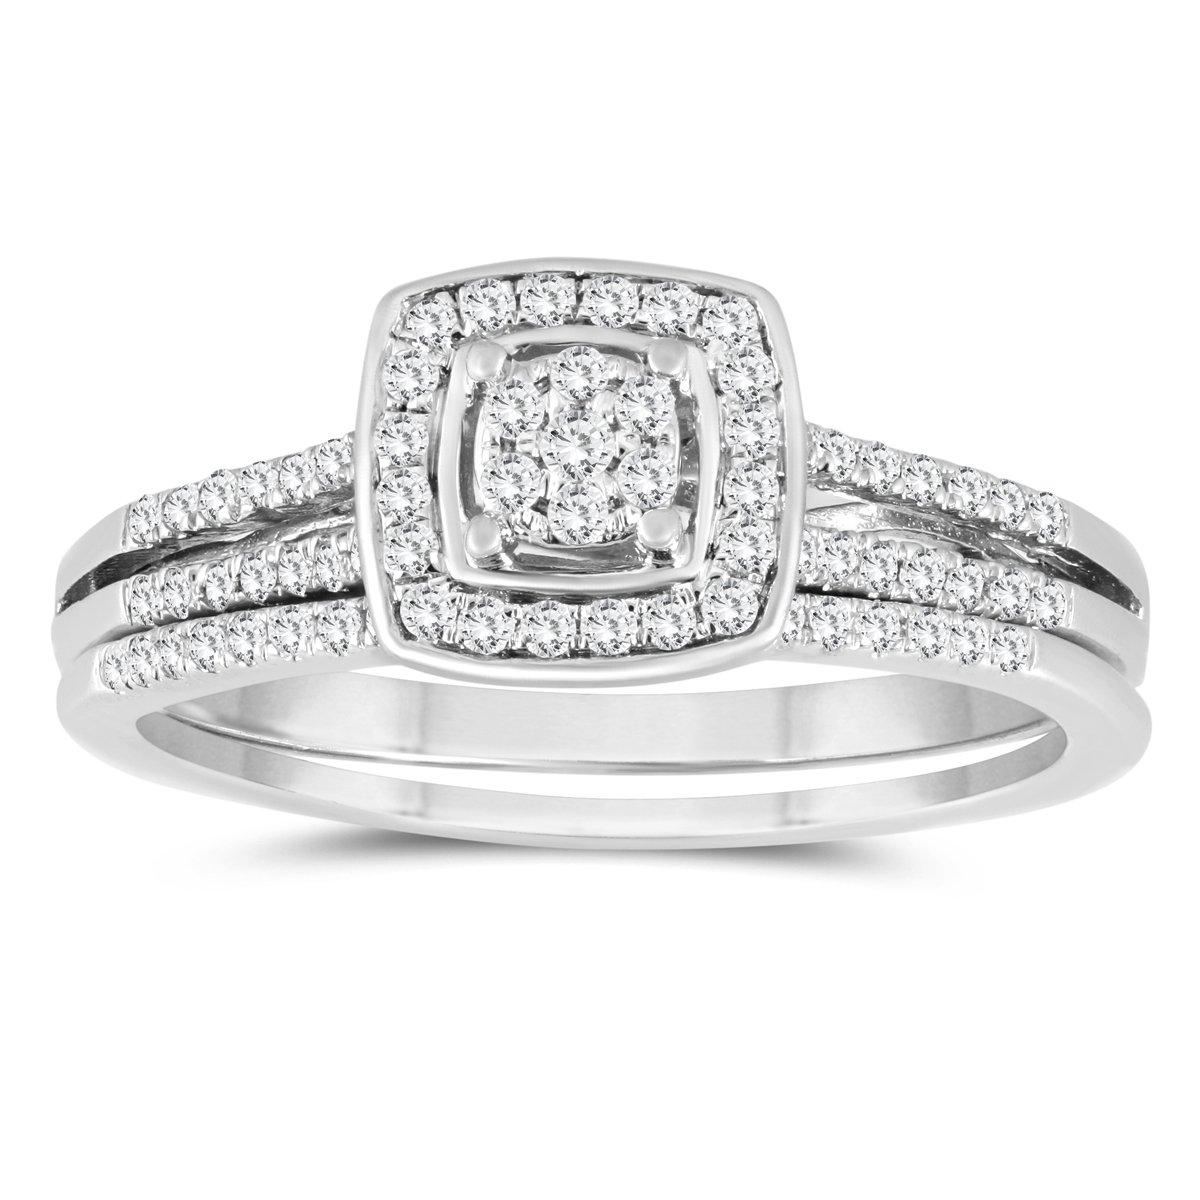 1/3 Carat TW Diamond Engagement Ring and Wedding Band Bridal Set in 10K White Gold